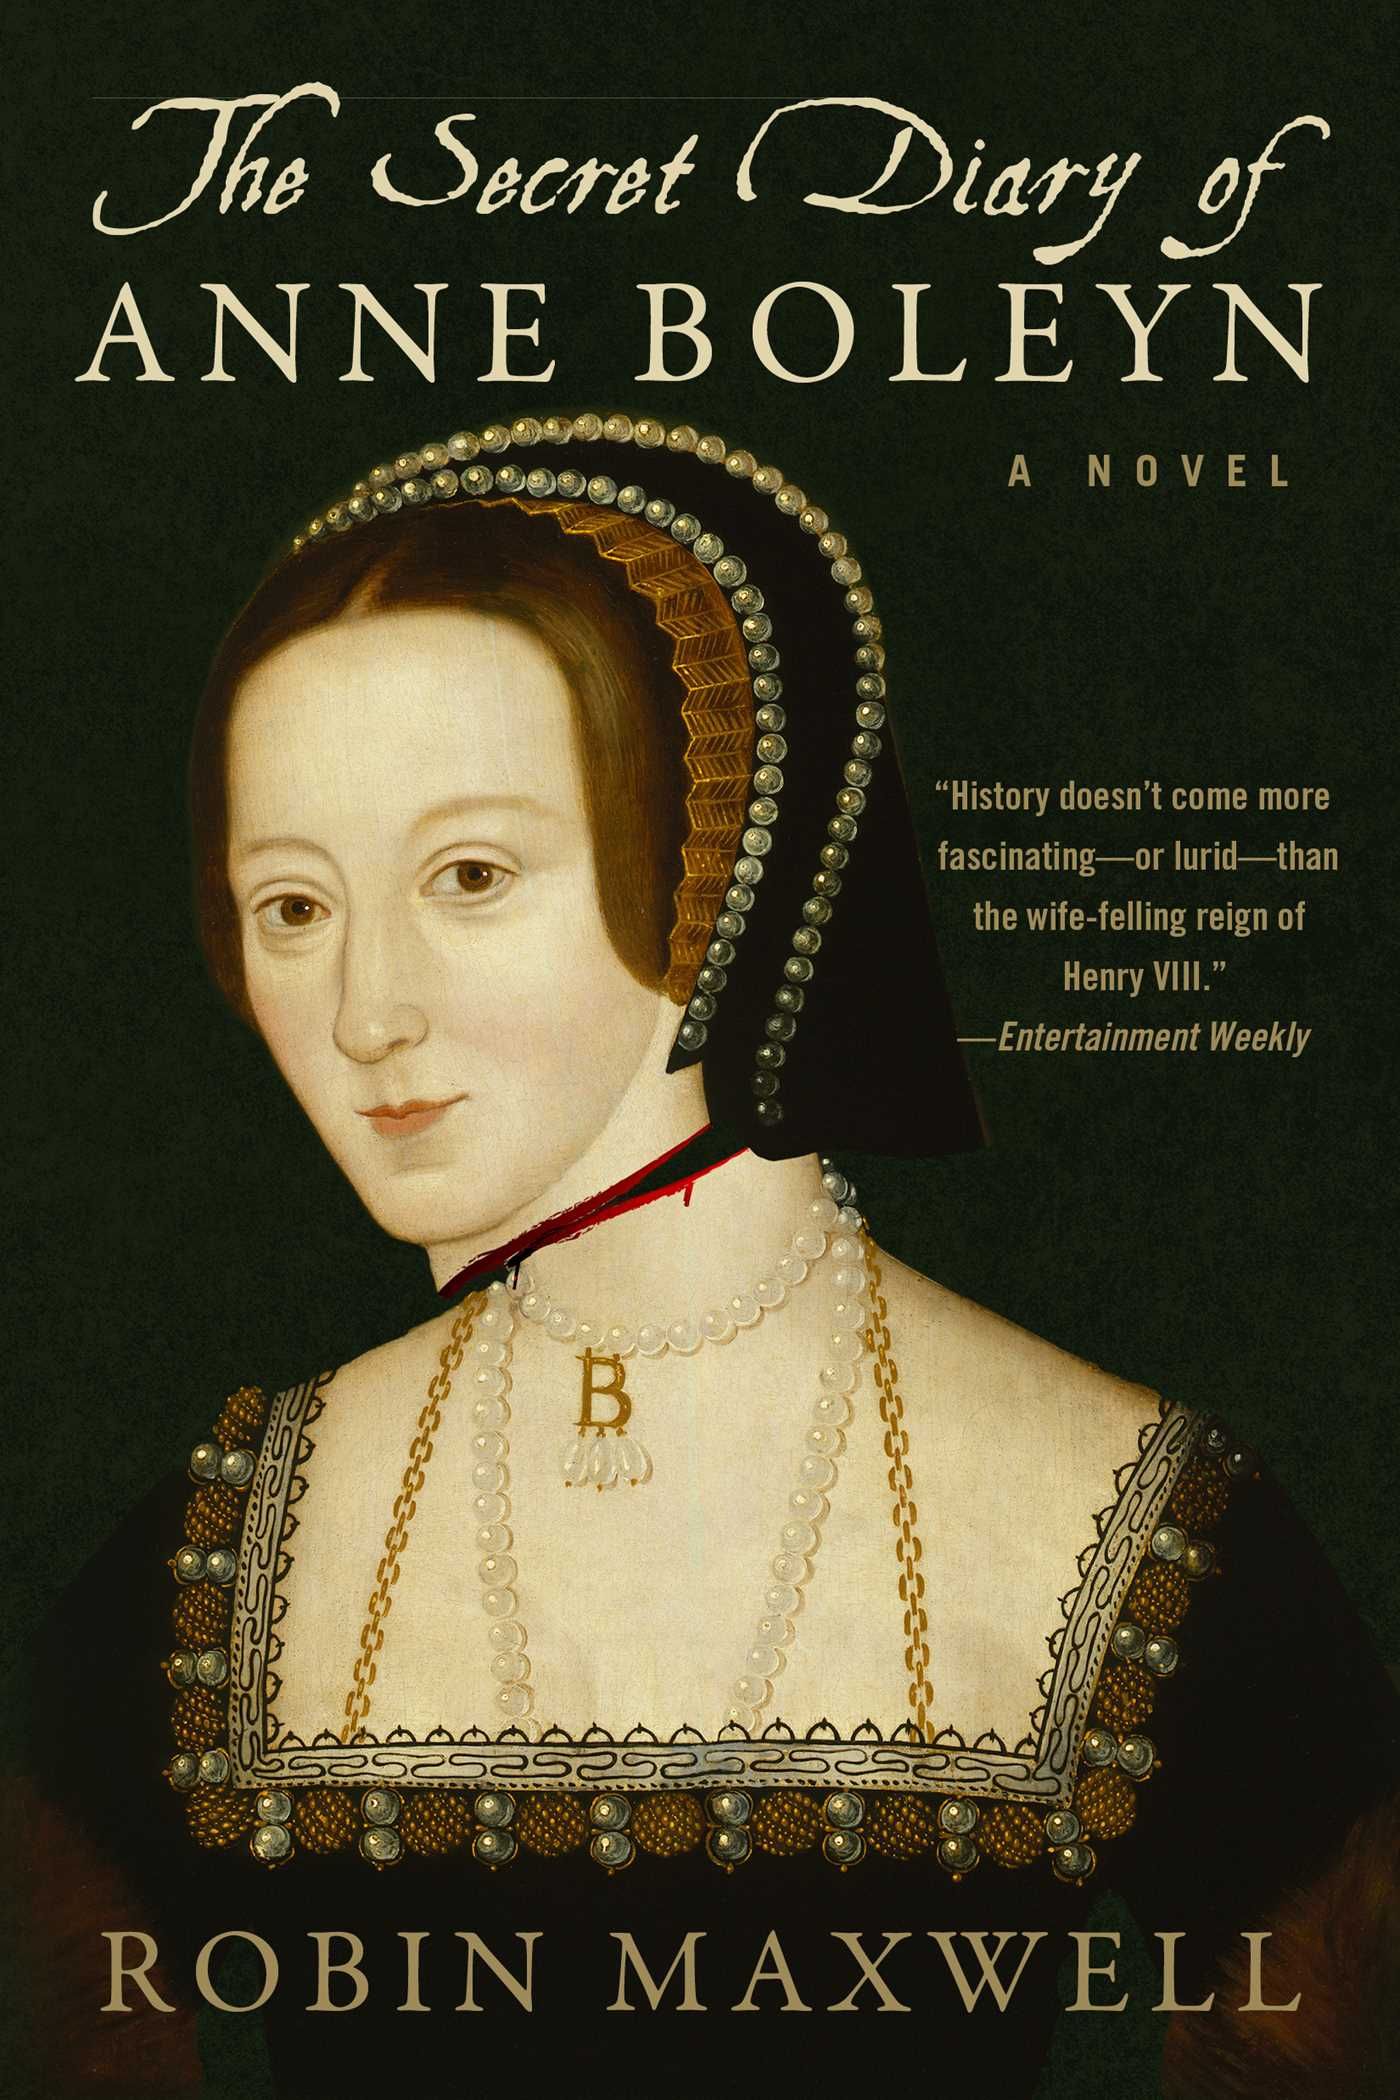 The Secret Diary of Anne Boleyn: A Novel